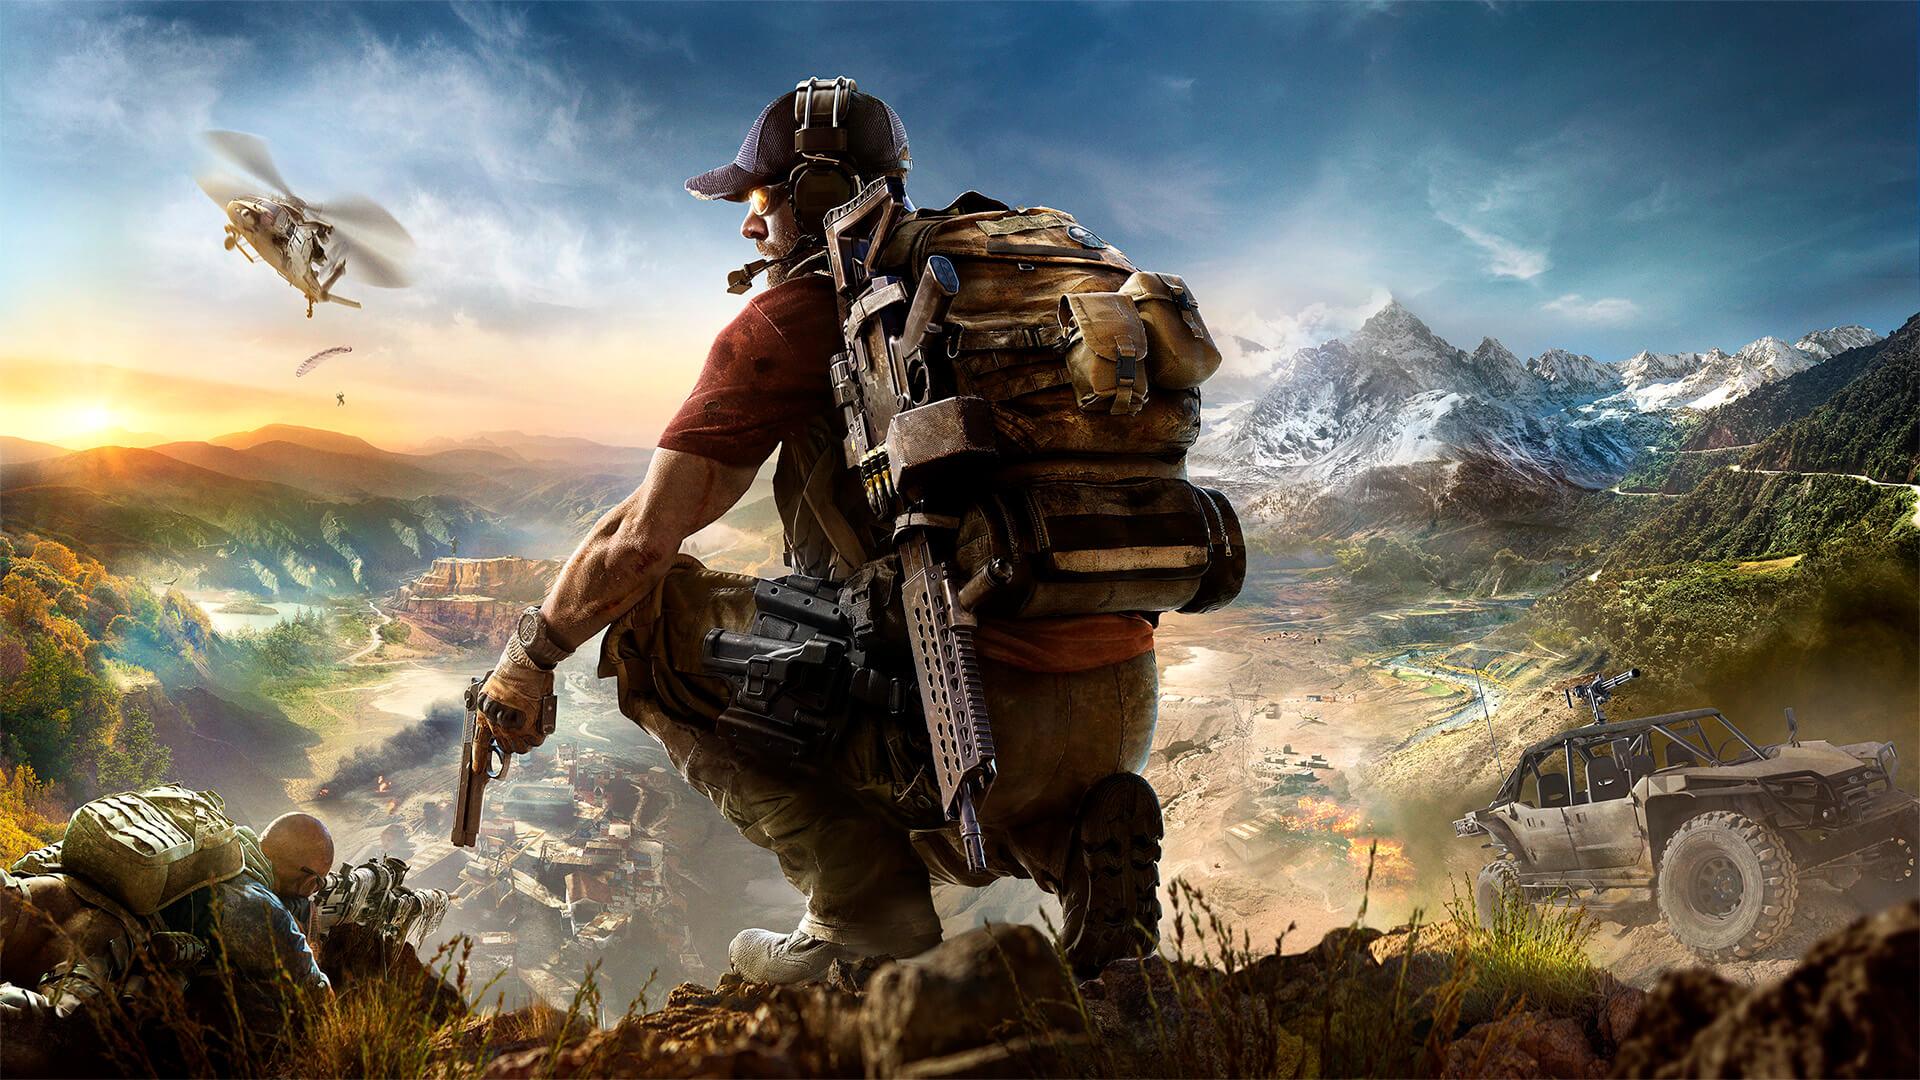 Tom Clancy's Ghost Recon Wildlands PC @Epic Games Store